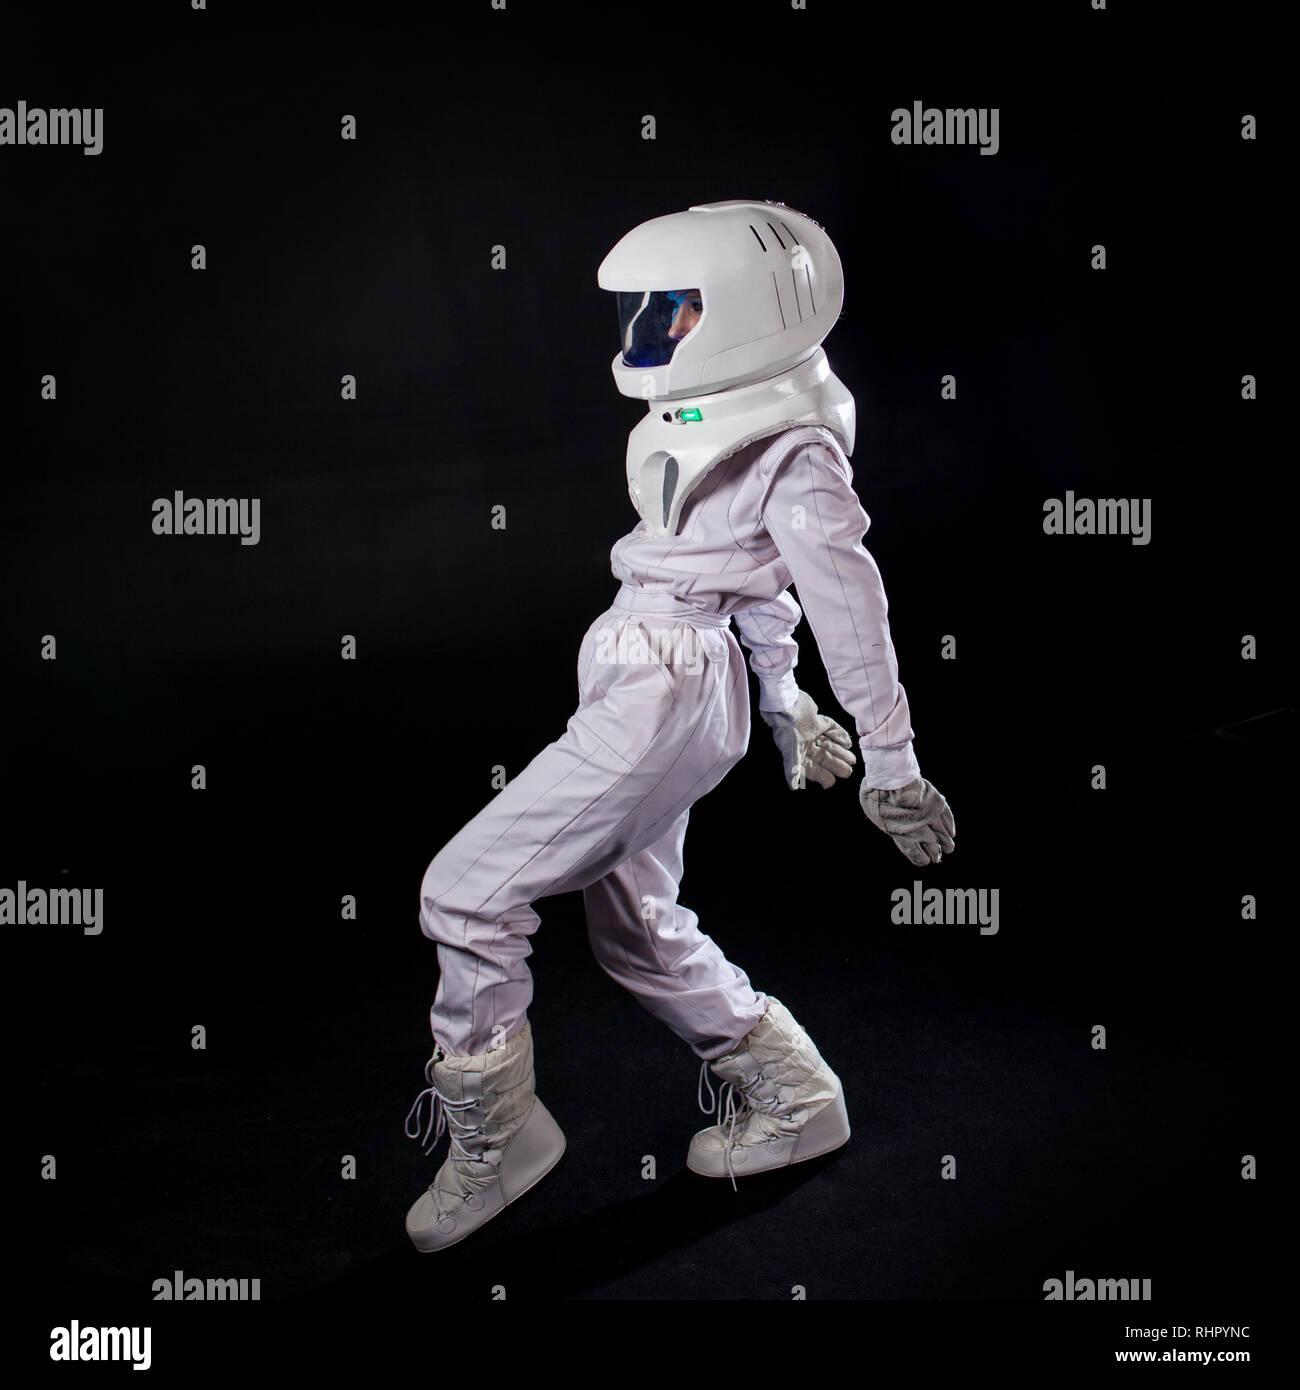 Running Astronaut in space, in zero gravity on black background